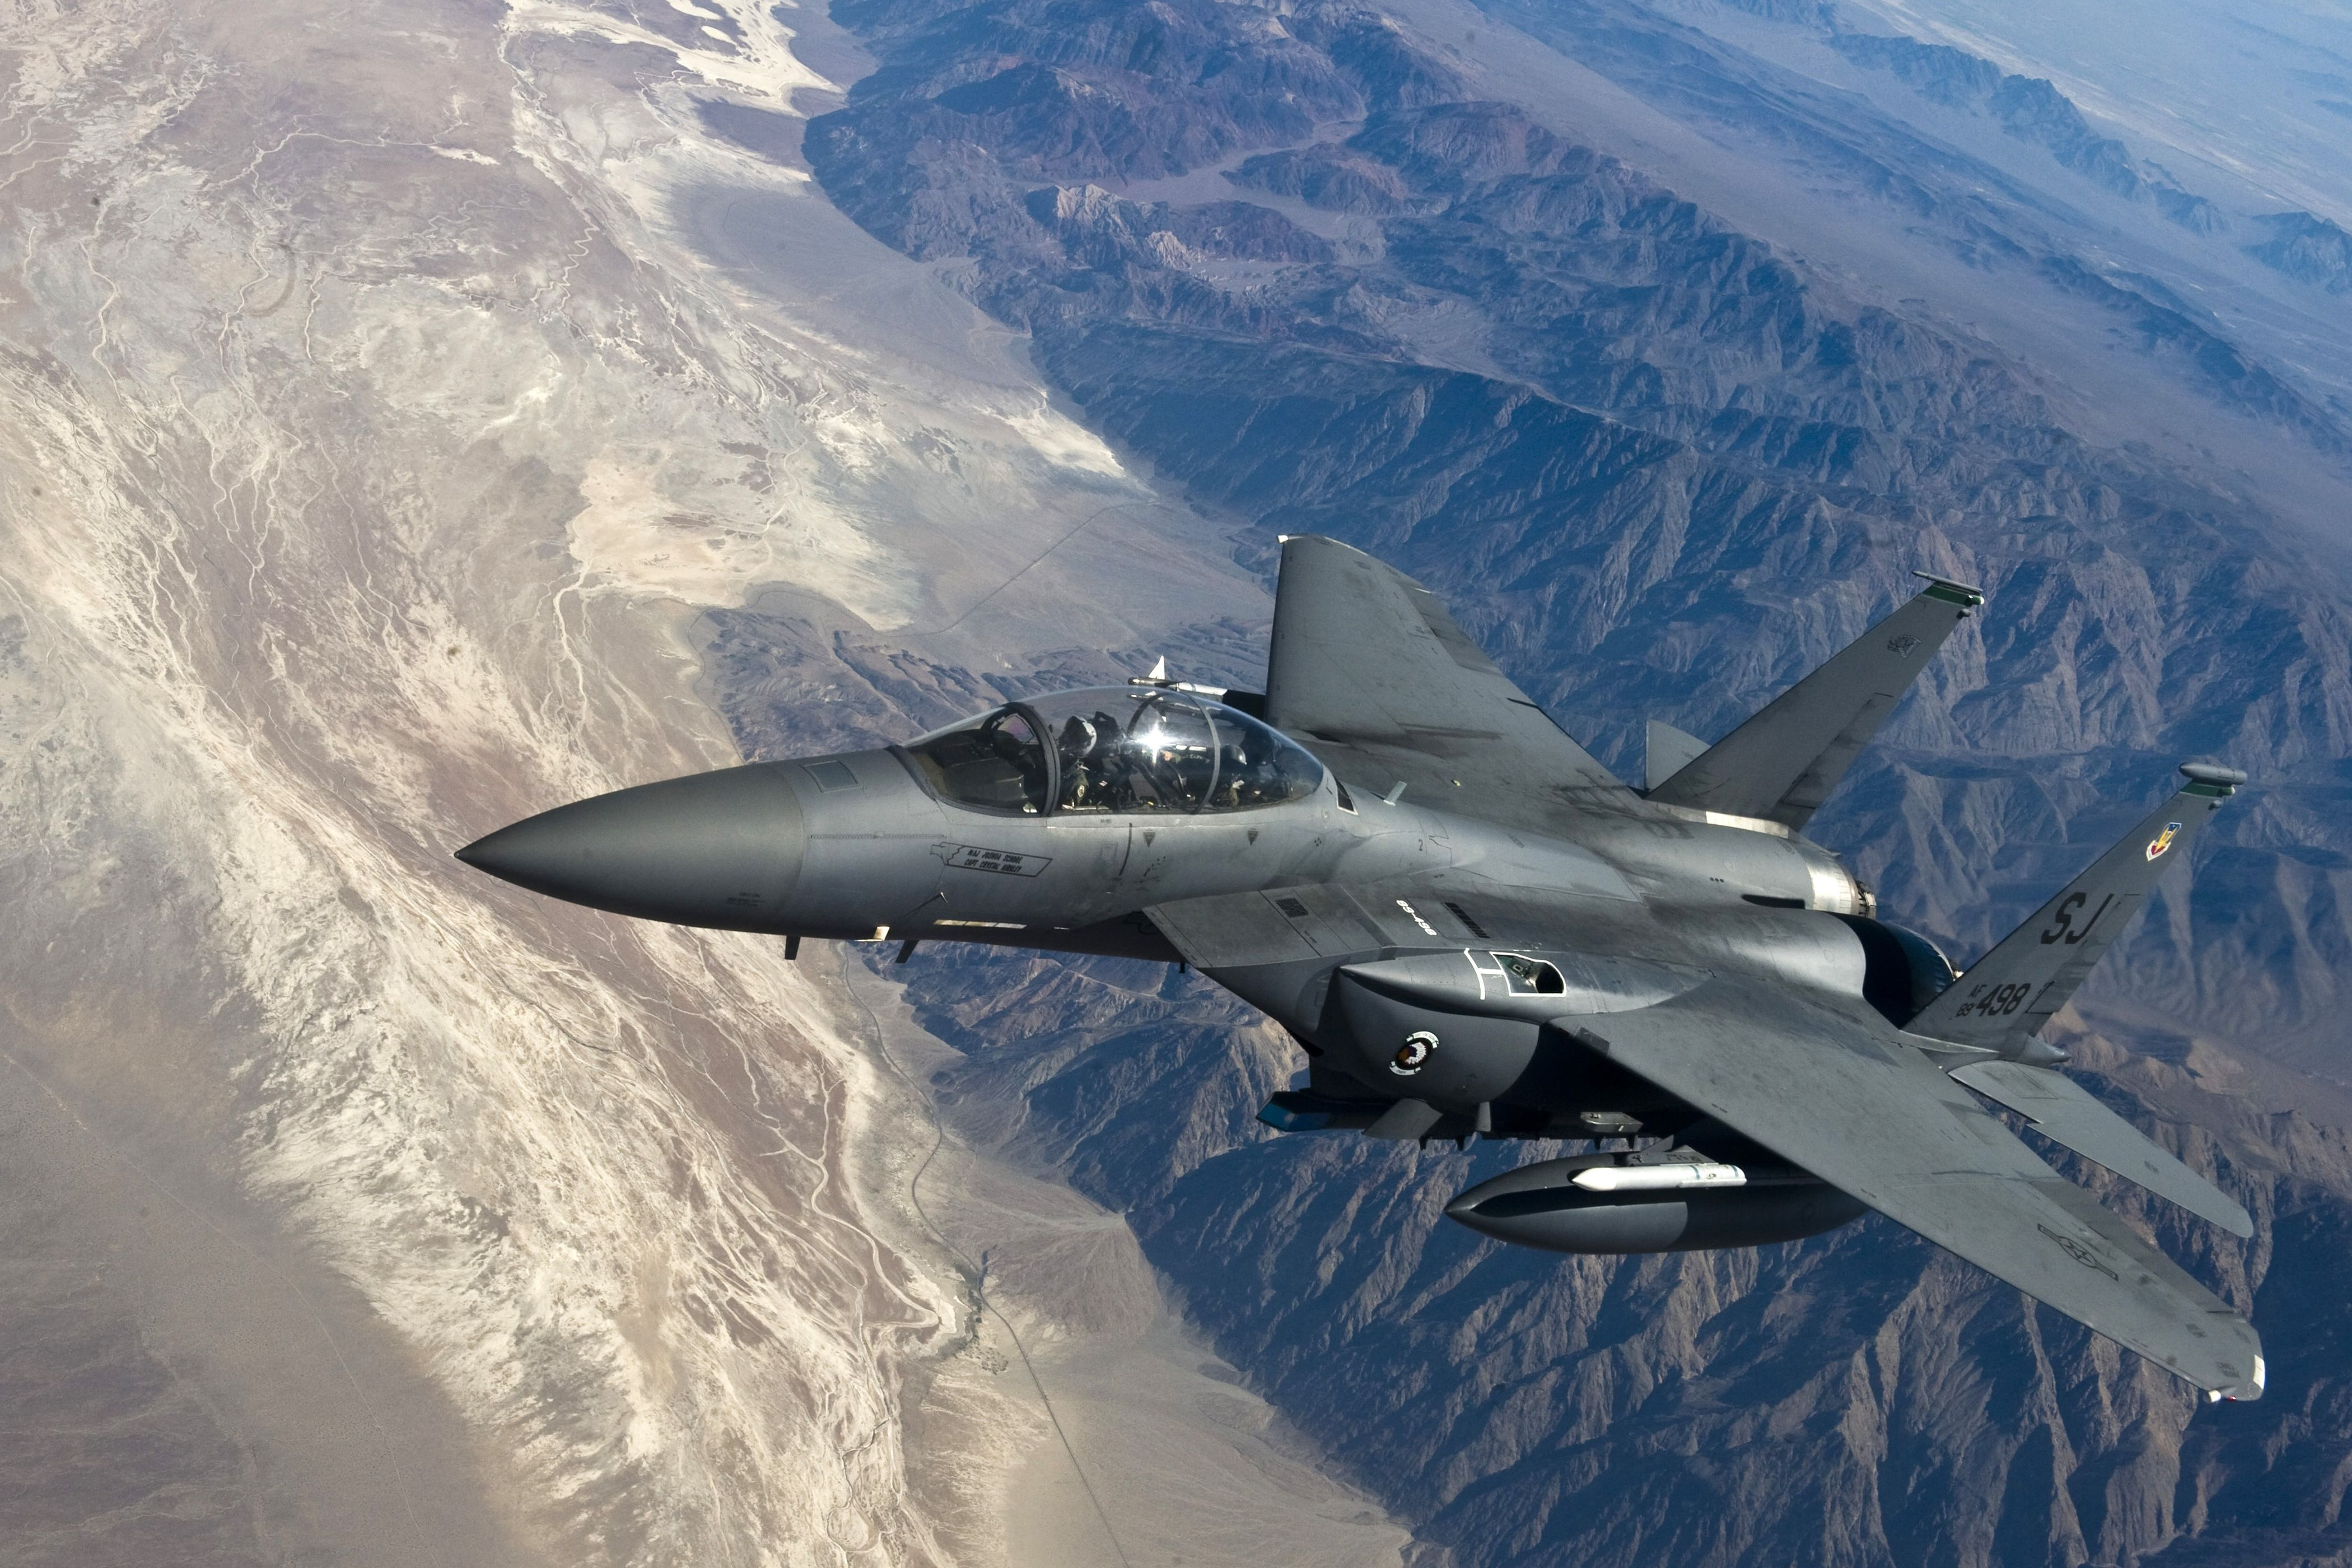 f-15e strike eagle 4k uhd wallpaper | wallpapers.gg